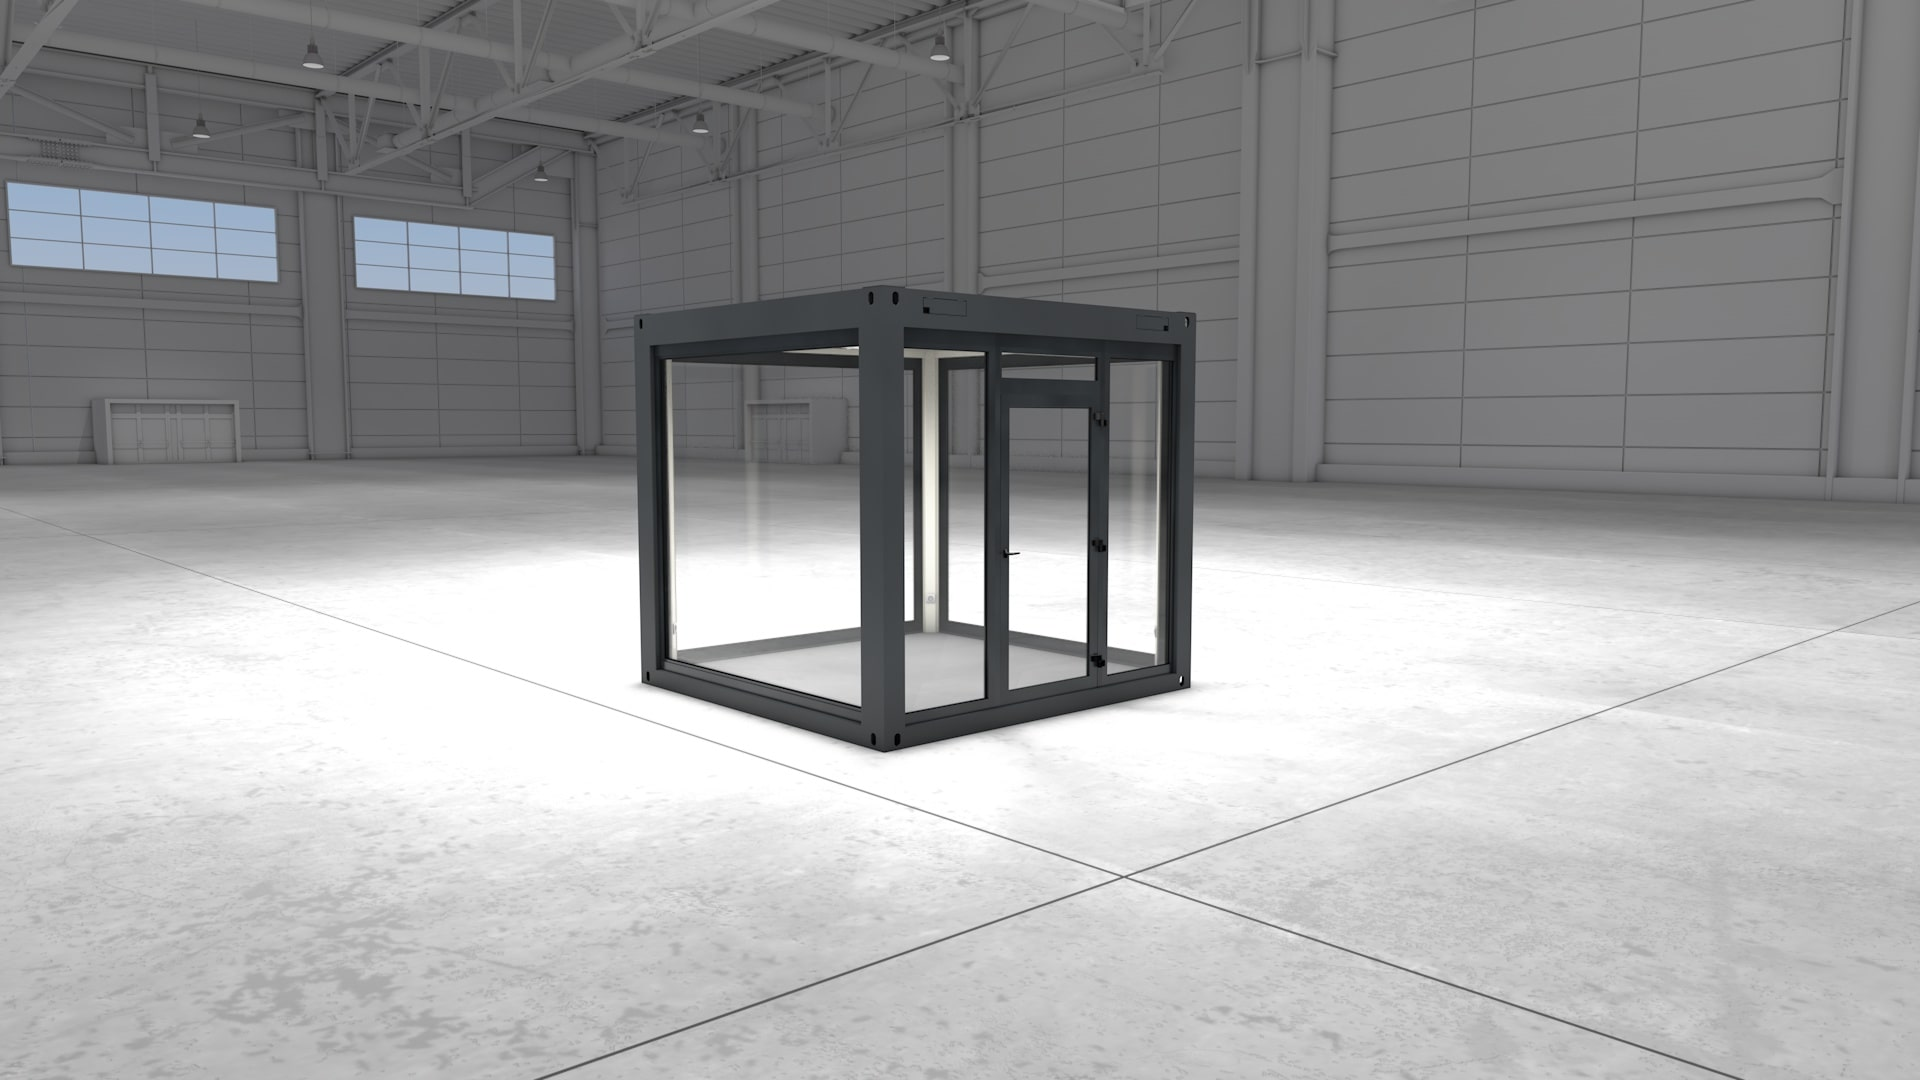 Cube 2 - Ansicht 2